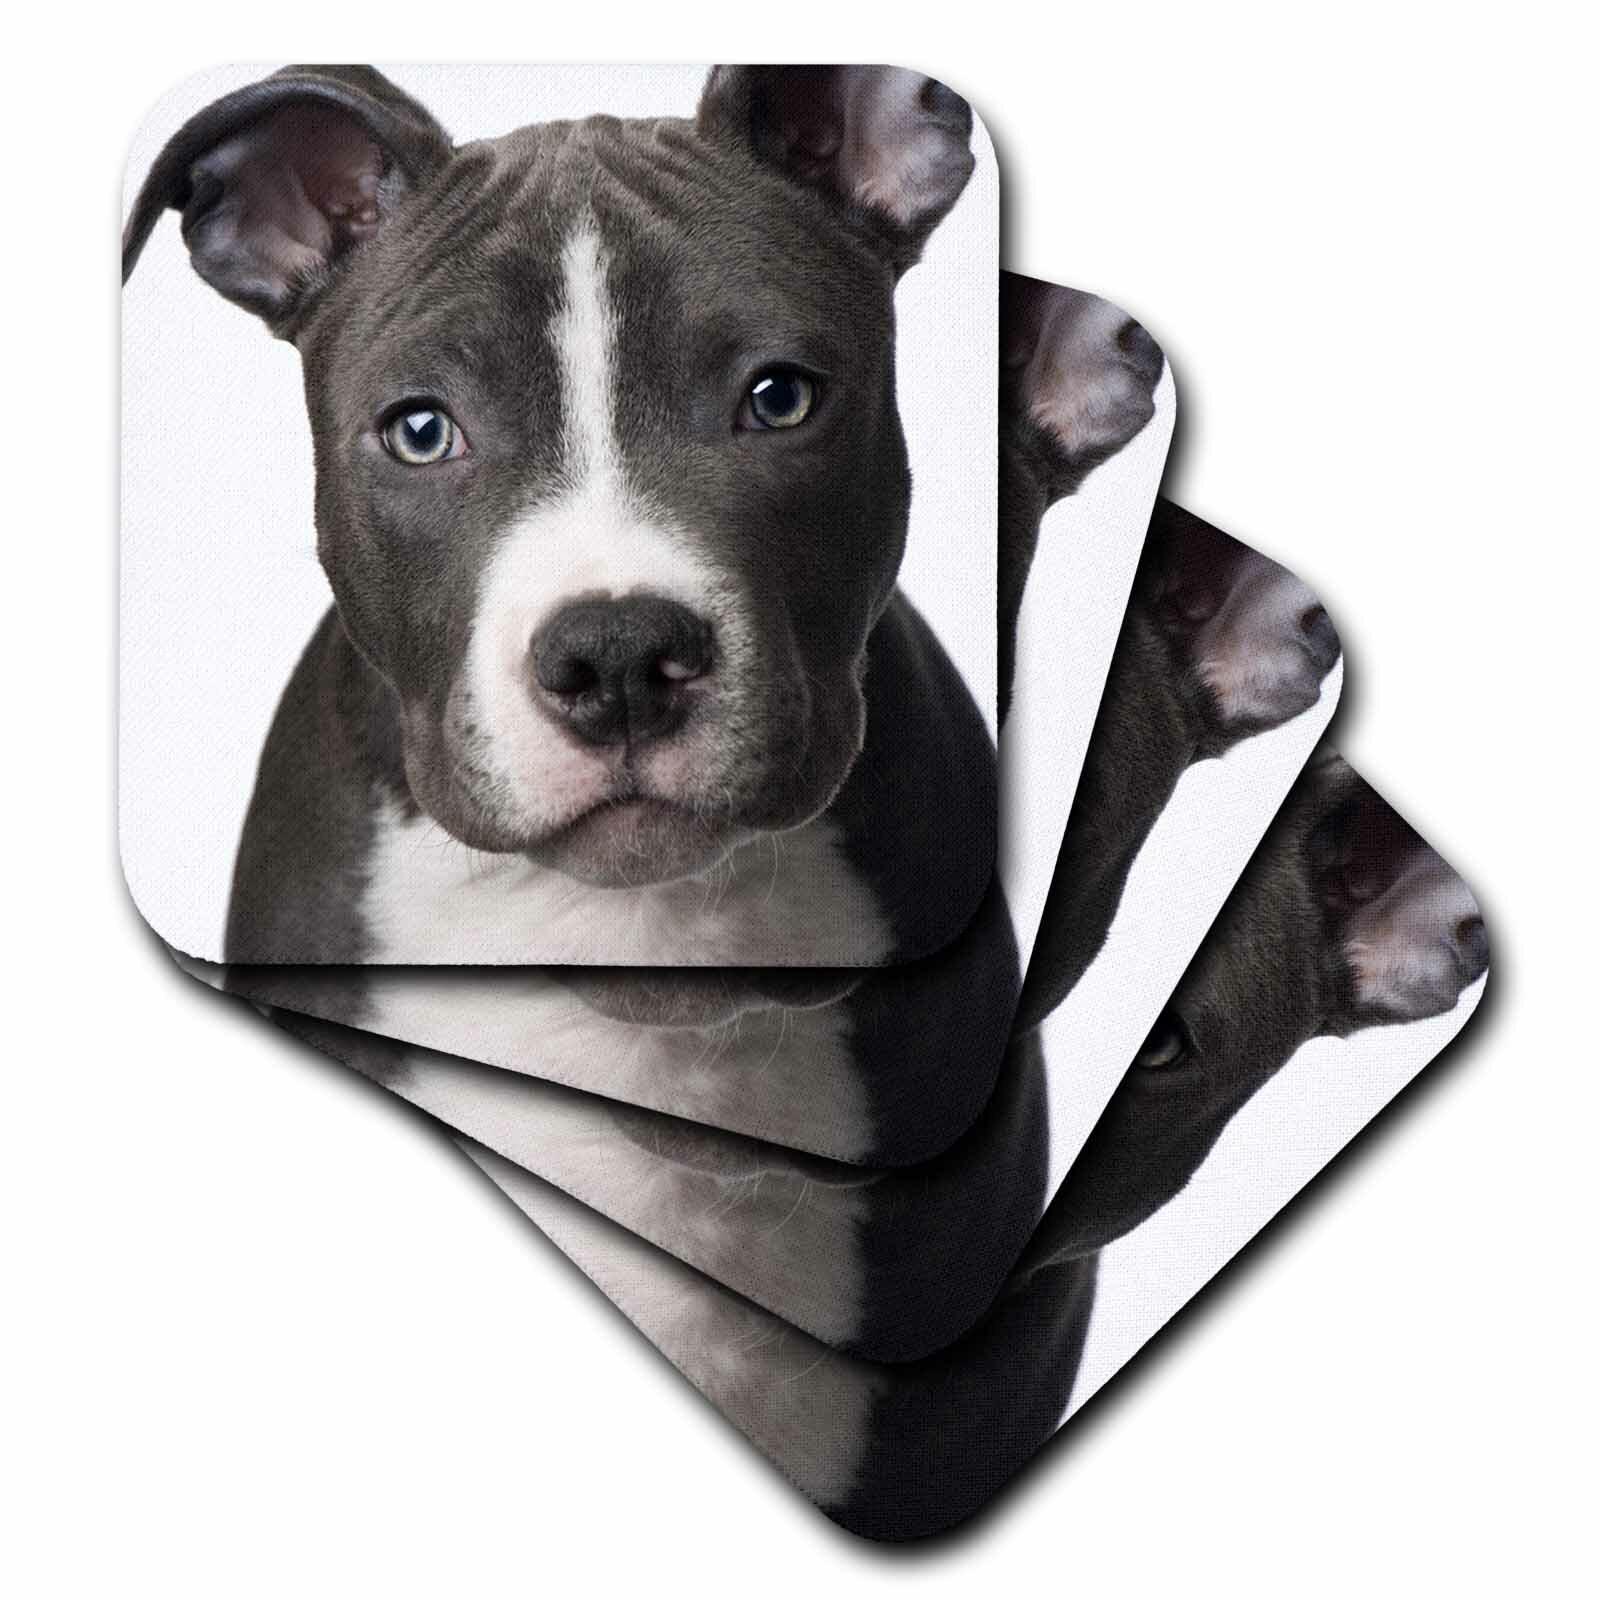 3drose Ceramic Tile Coasters American Pit Bull Terrier Puppy Set Of 4 Cst 4240 3 Wayfair